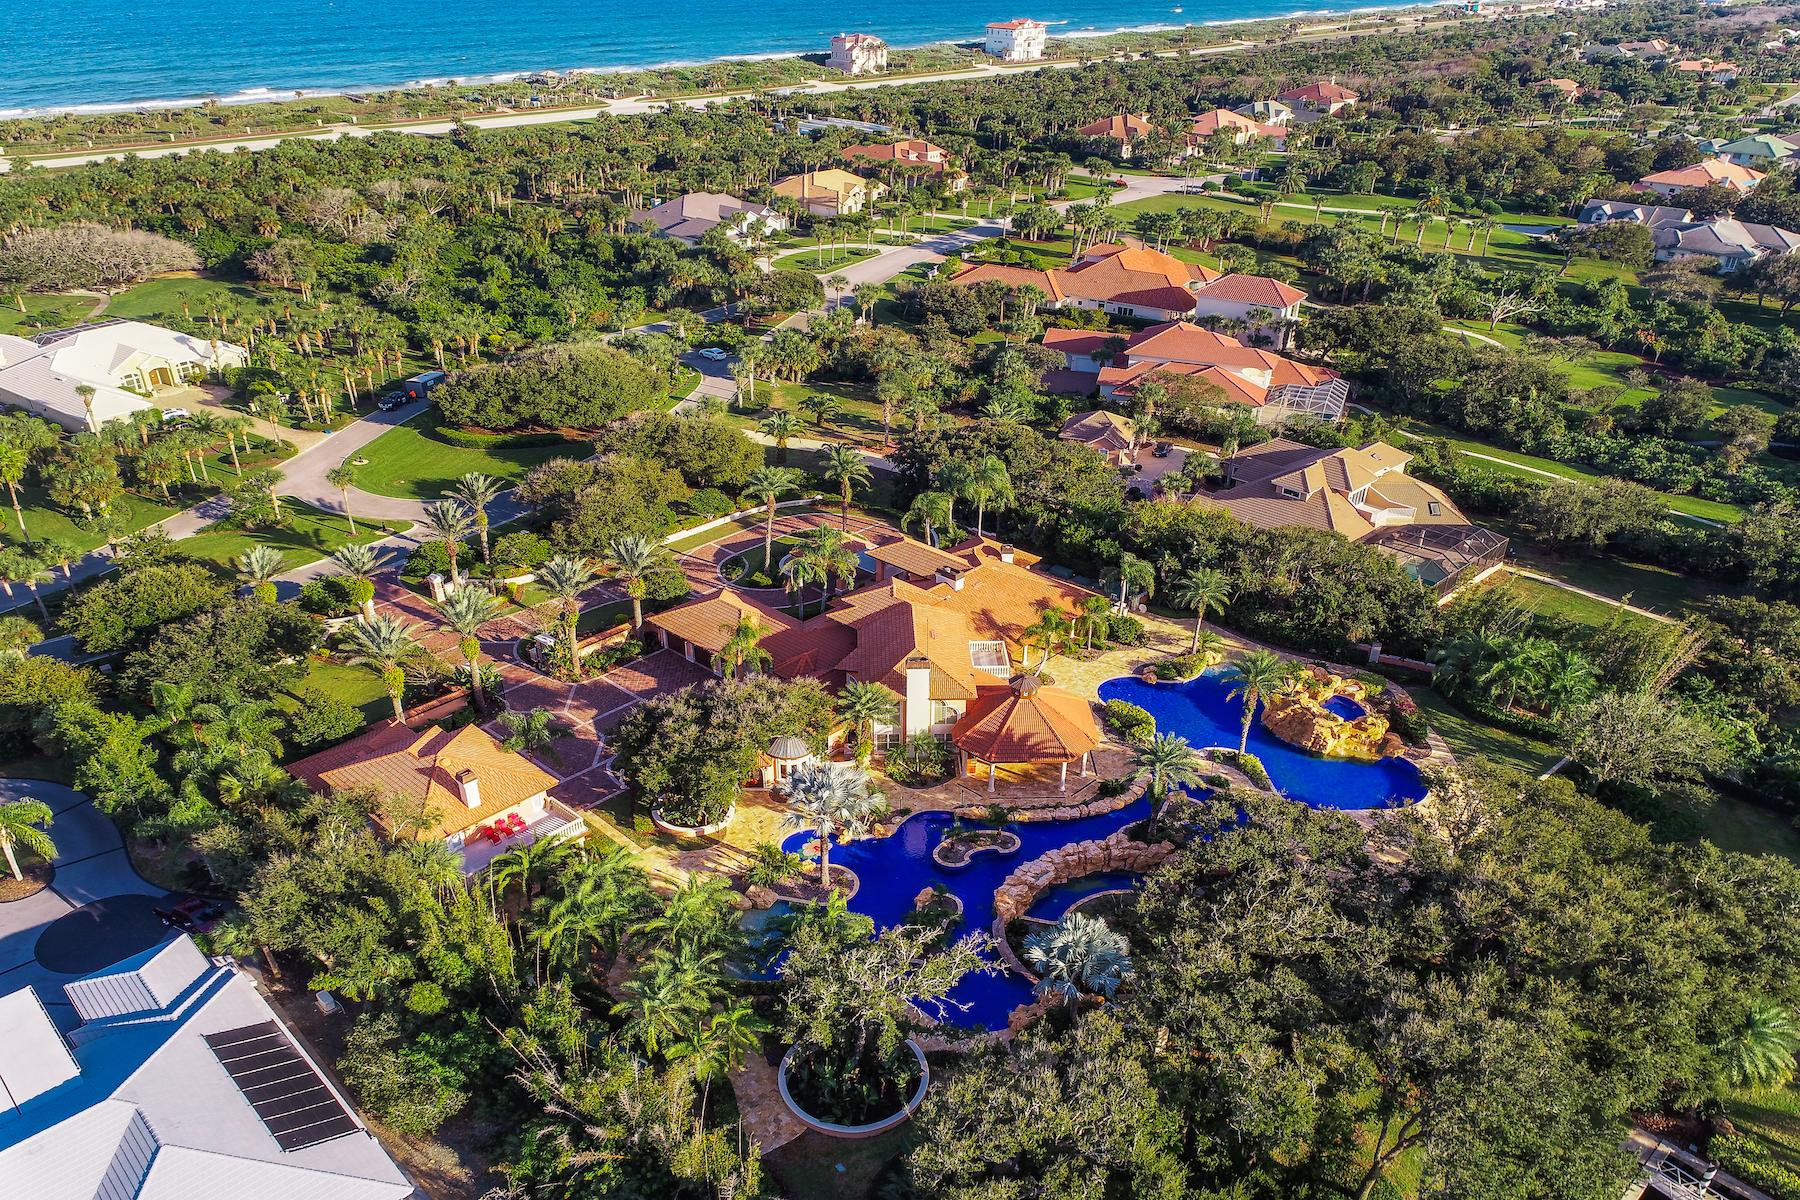 Single Family Homes for Sale at 42 Island Estates Pkwy 42 Island Estates Parkway Palm Coast, Florida 32137 United States